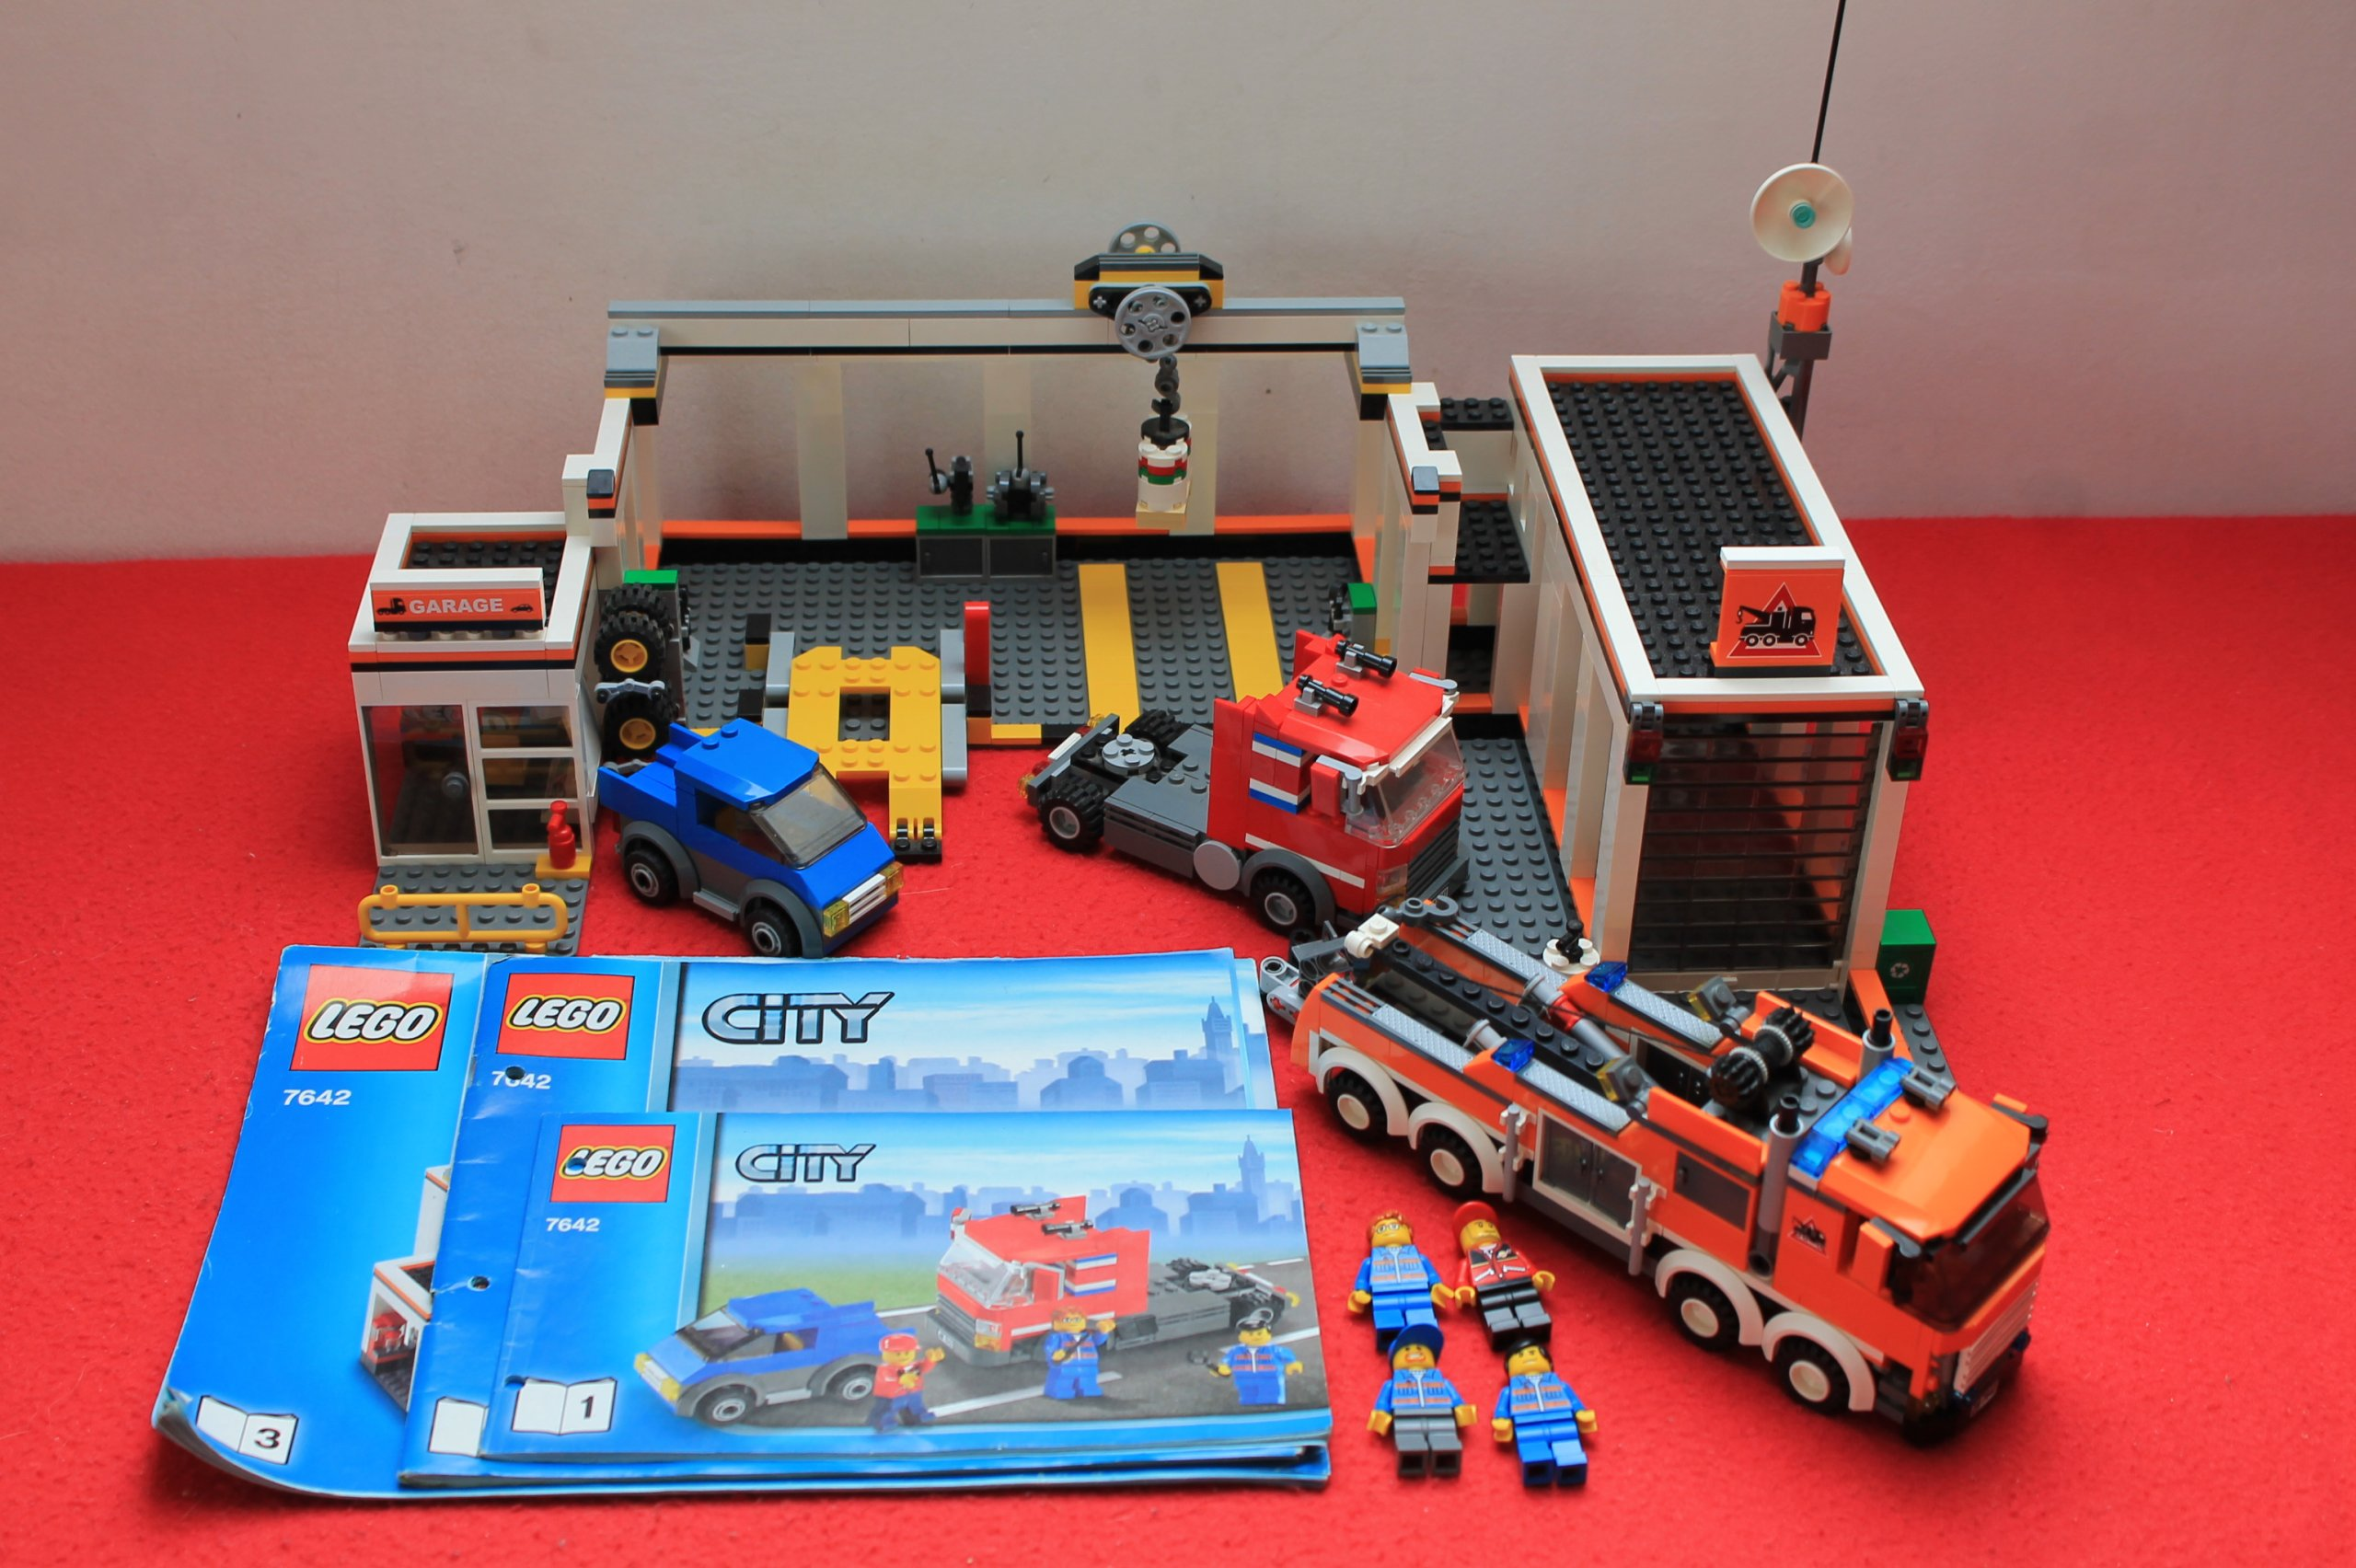 Lego 7642 Garage 7268973770 Oficjalne Archiwum Allegro